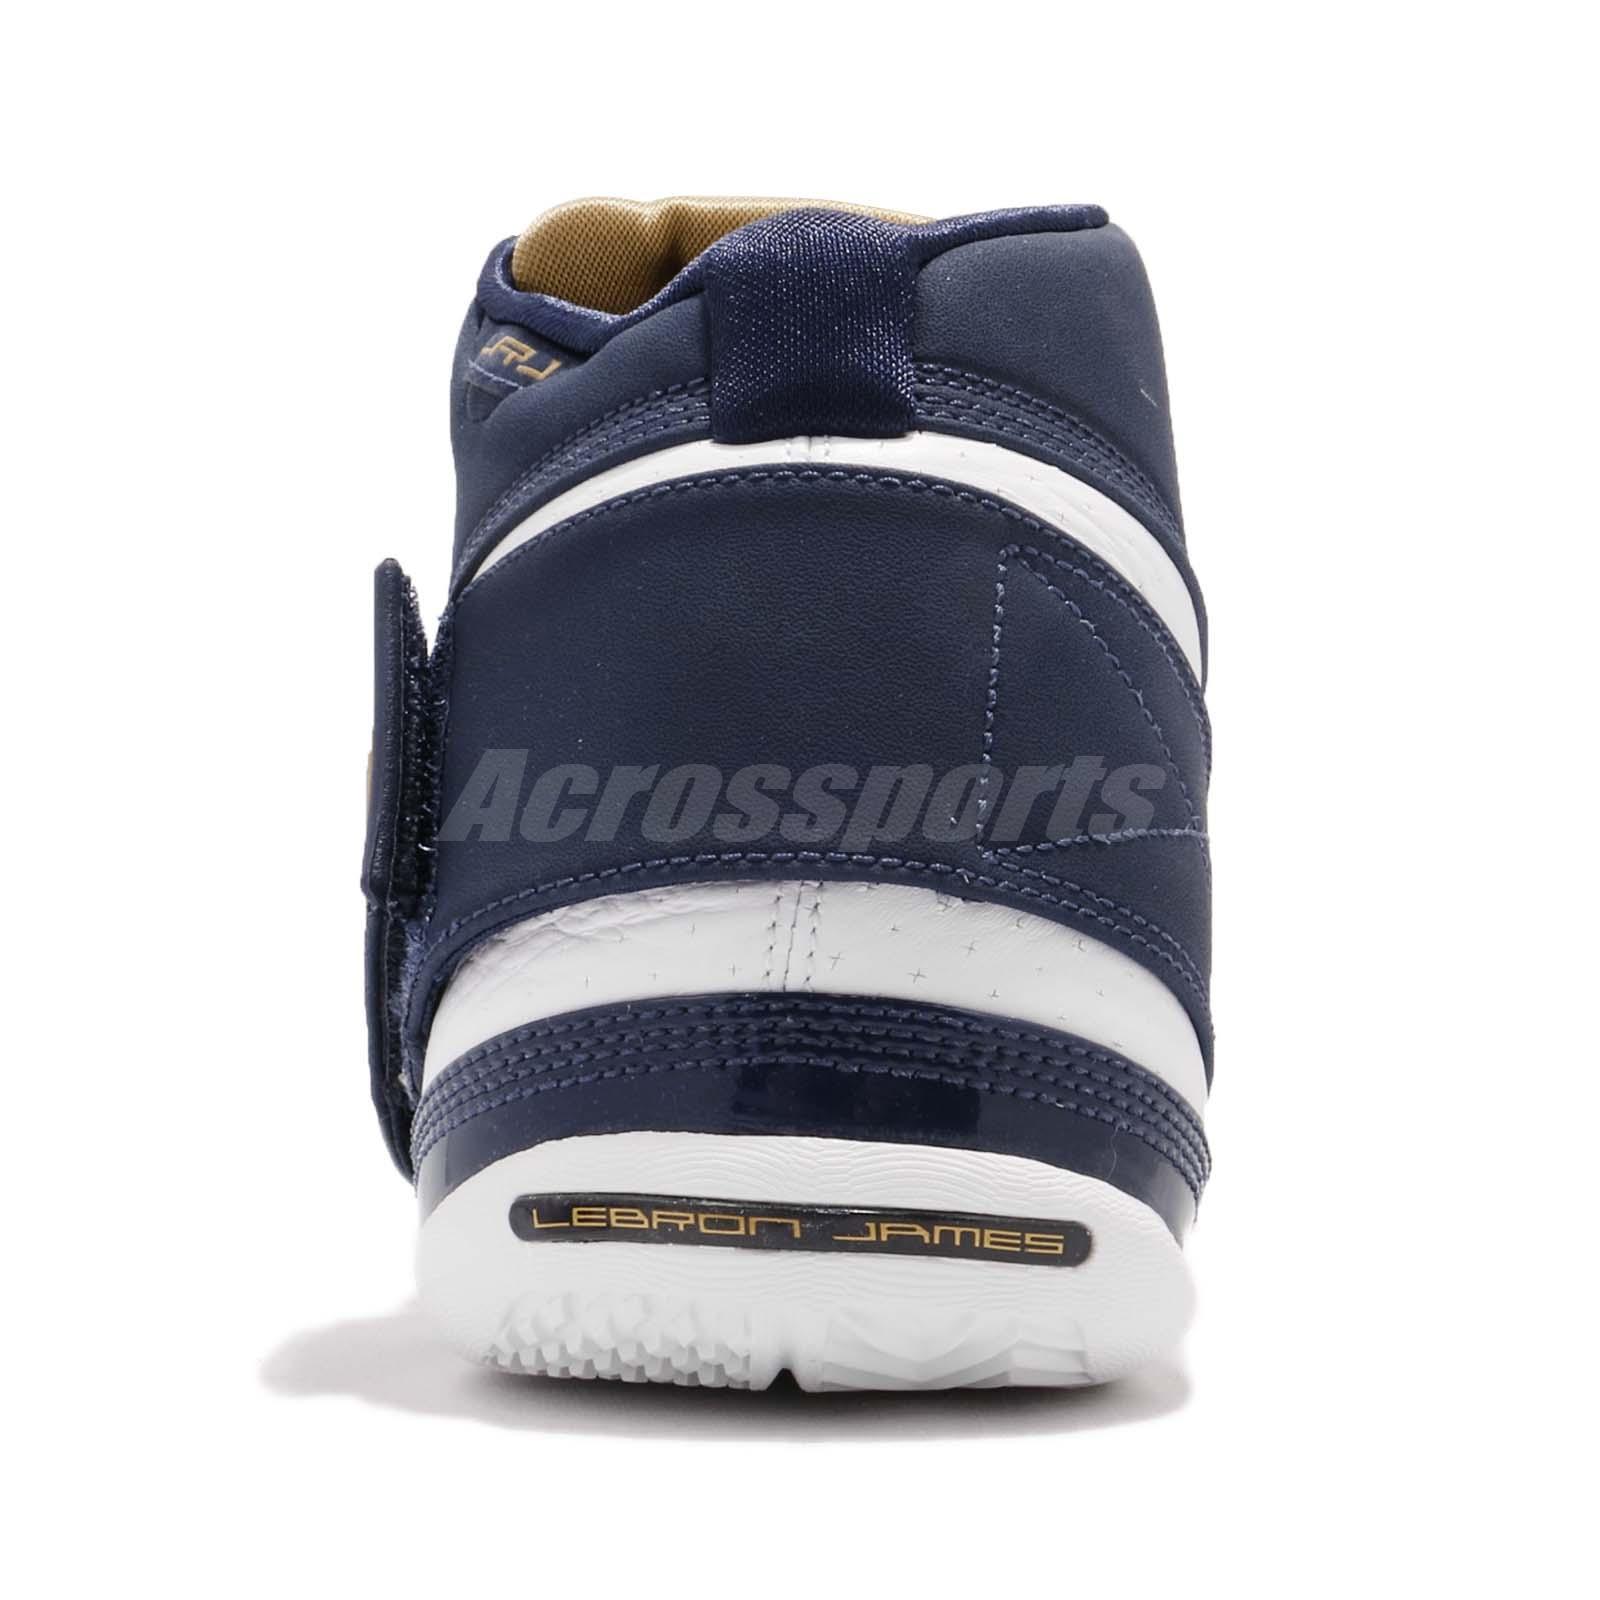 brand new d8dfd 644c0 Nike Zoom LeBron Soldier CT16 QS 25 Straight James Navy White Men ...